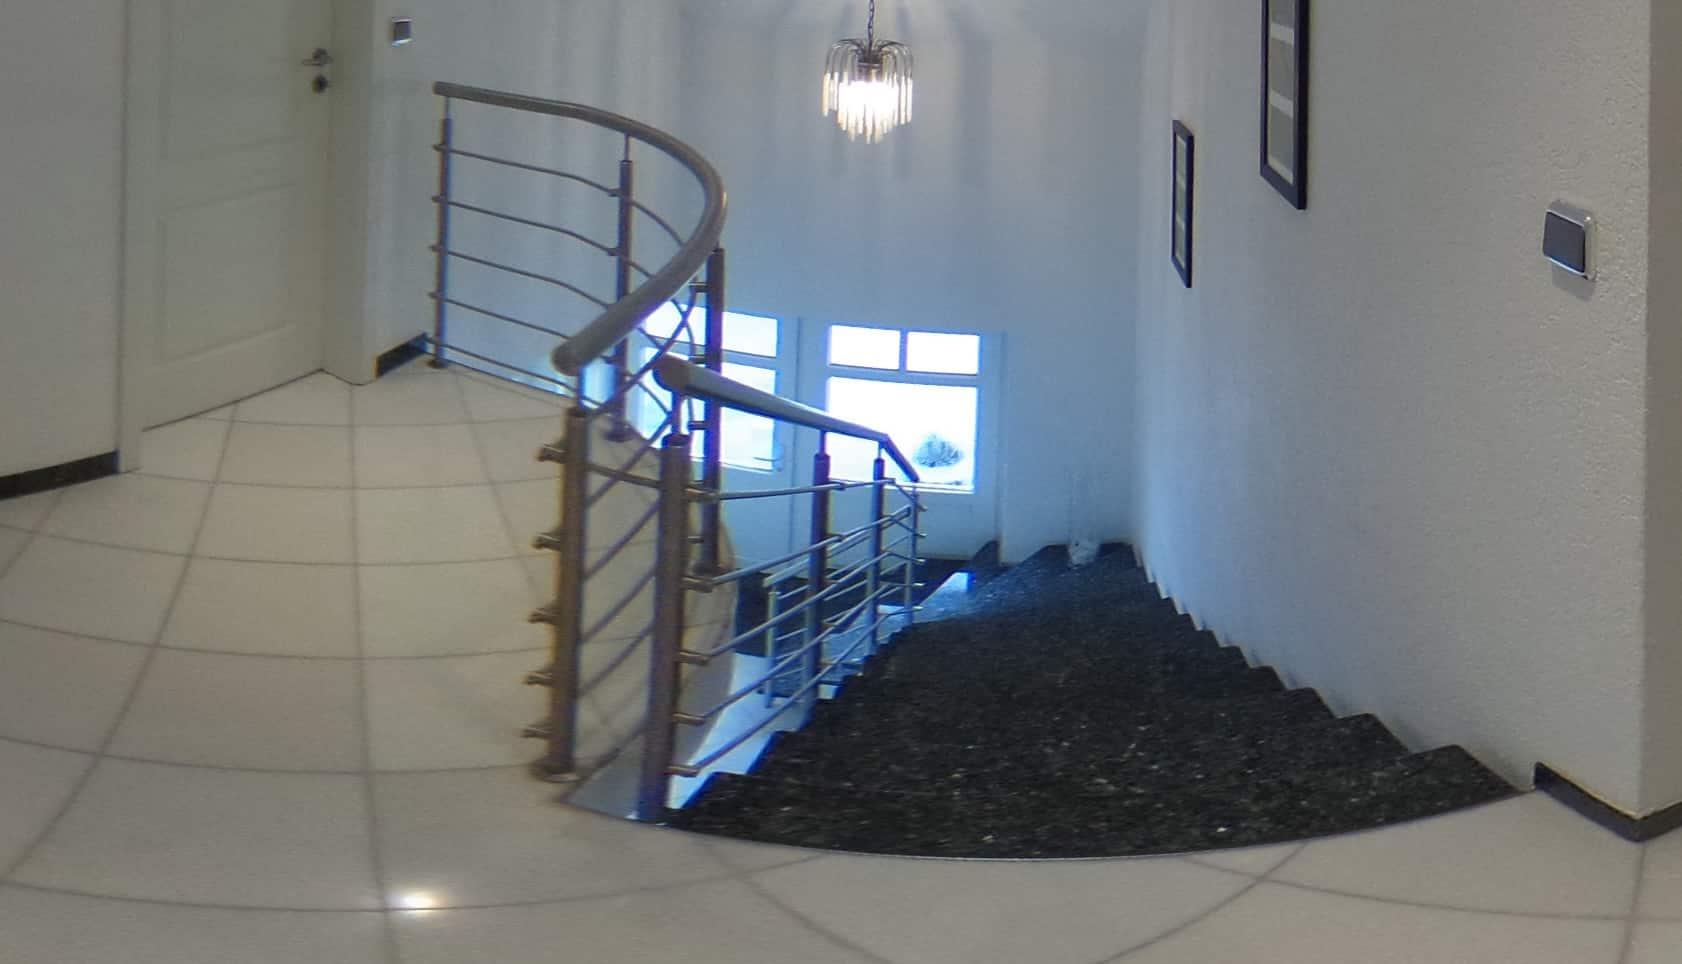 360 Grad Kamera vs Professionelles 360 Grad Panorama